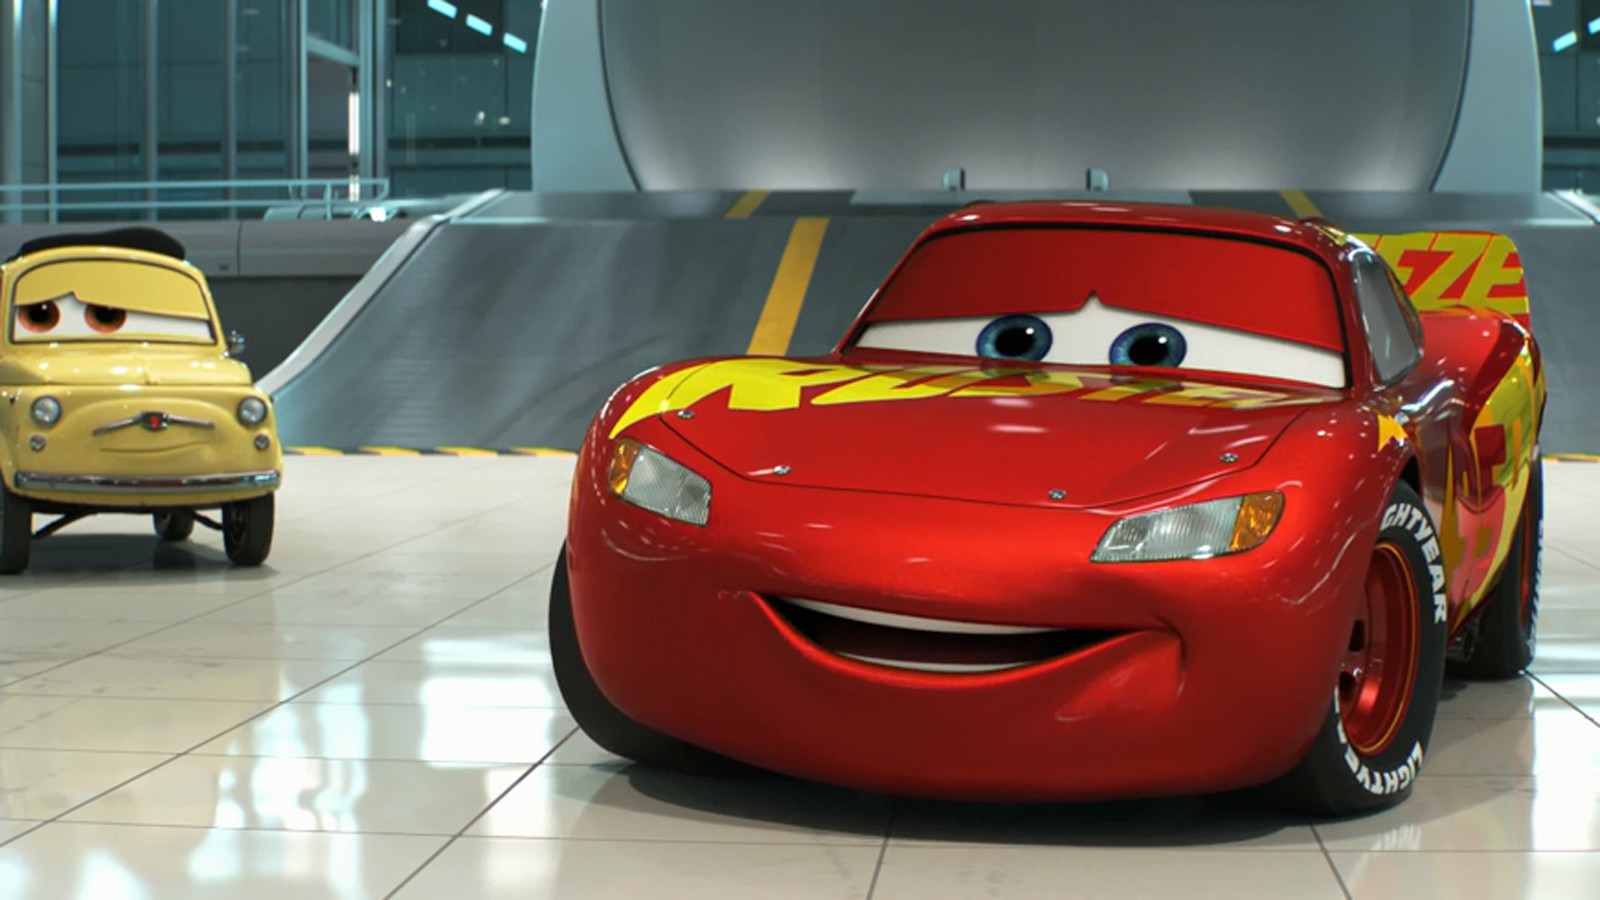 pixar 39 s 39 cars 3 39 should unseat 39 wonder woman 39 at the box. Black Bedroom Furniture Sets. Home Design Ideas